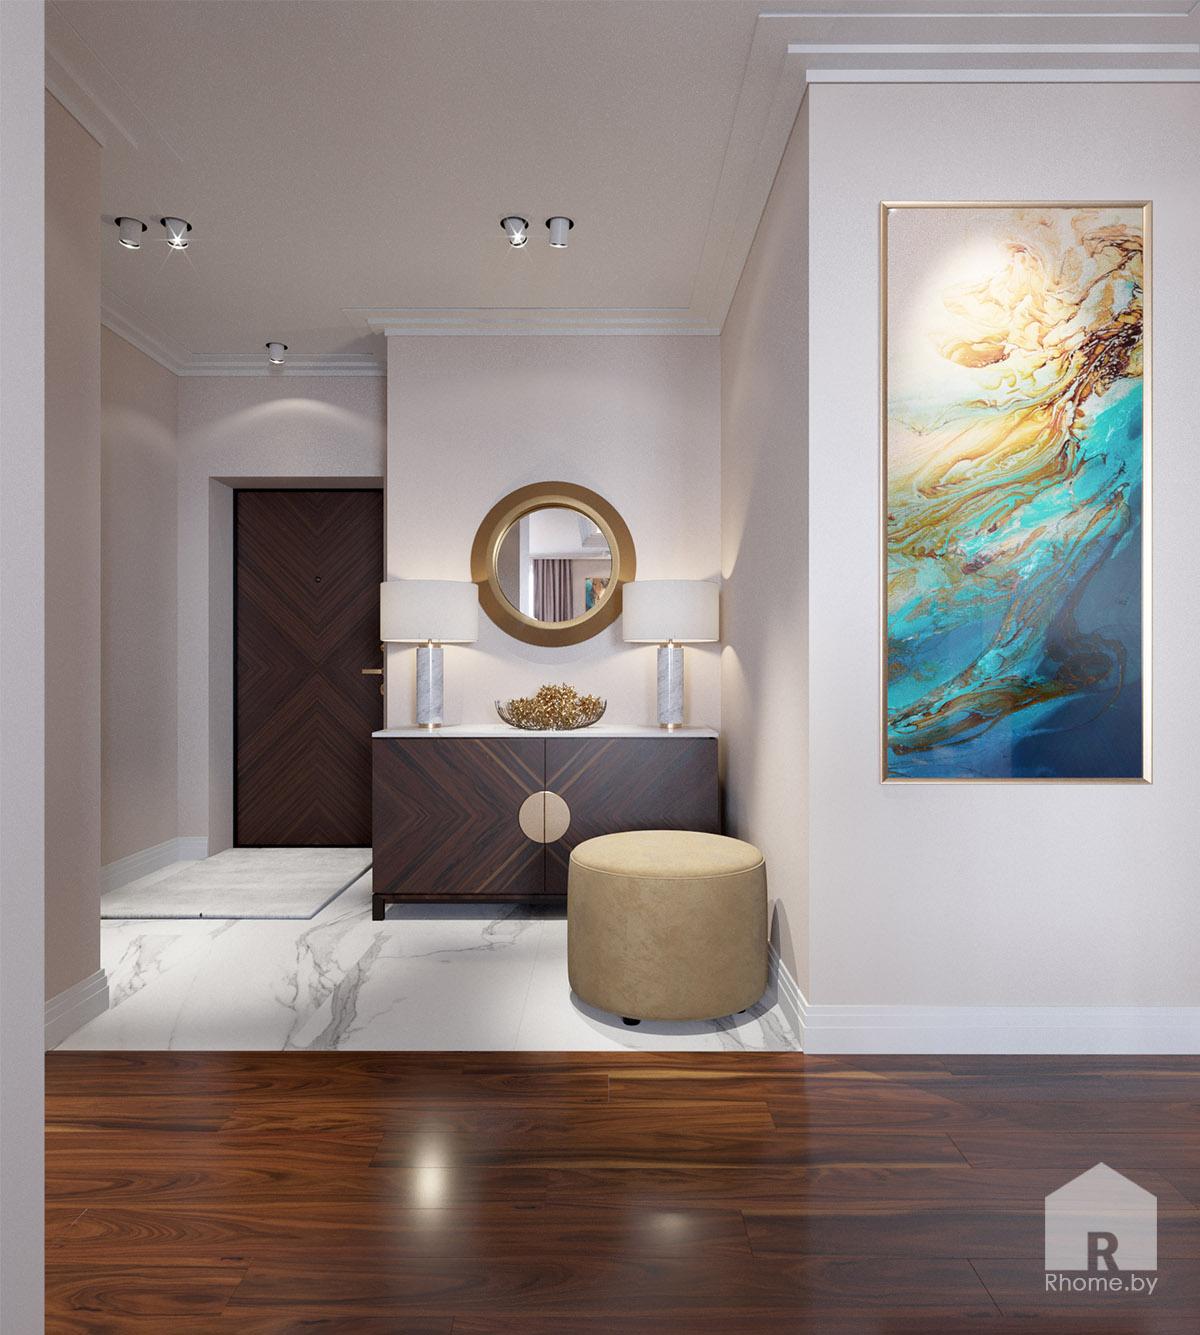 Дизайн холла по ул. Восточная | Дизайн студия – Rhome.by